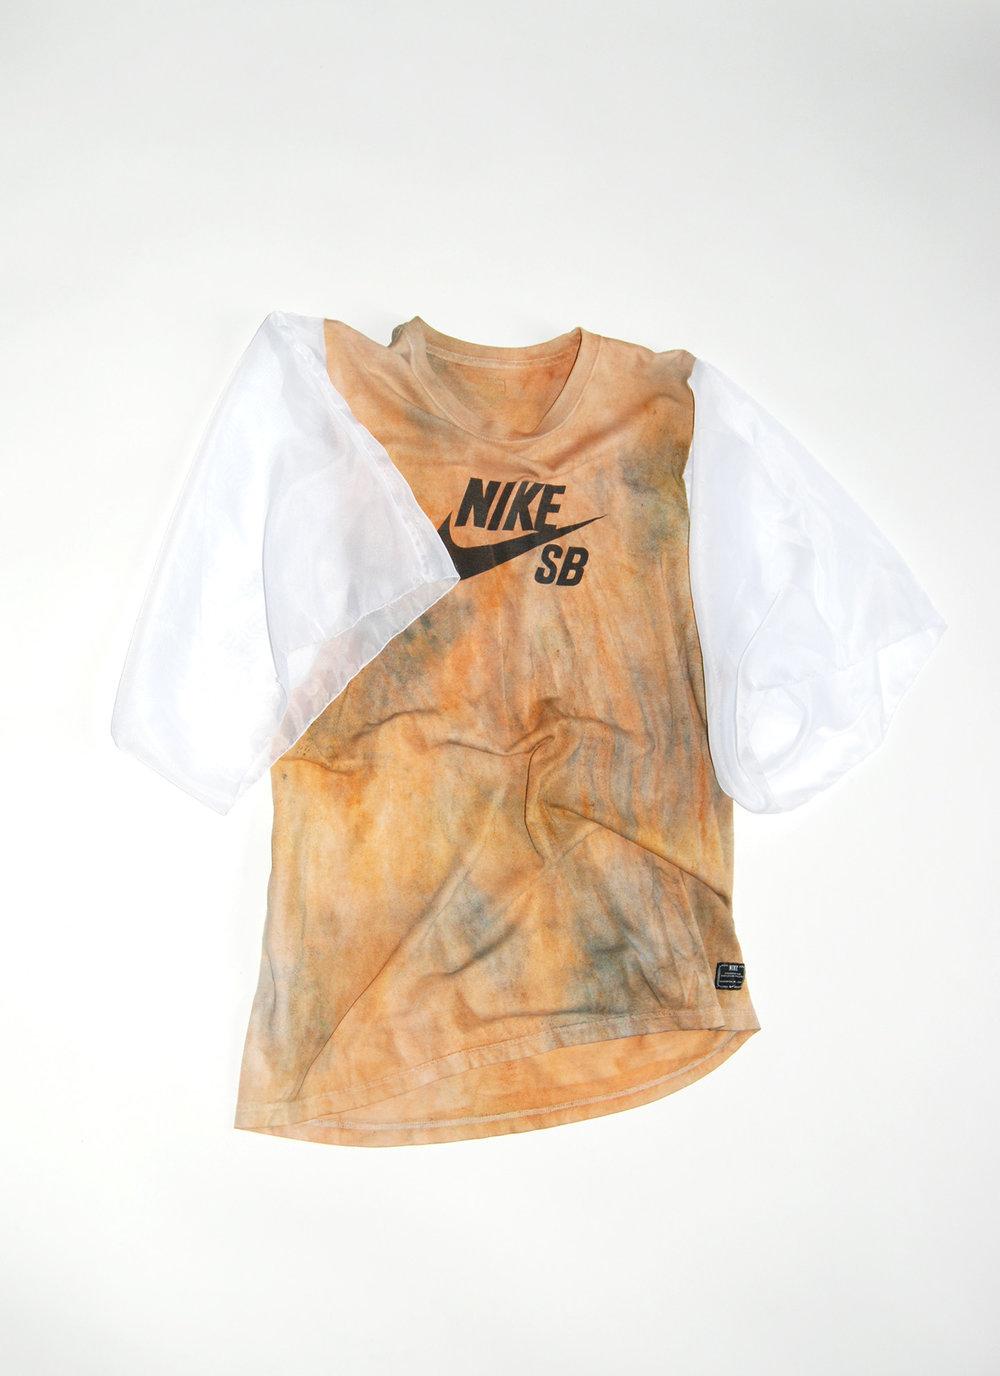 Dreamy Nike T by Cat Lauigan $80